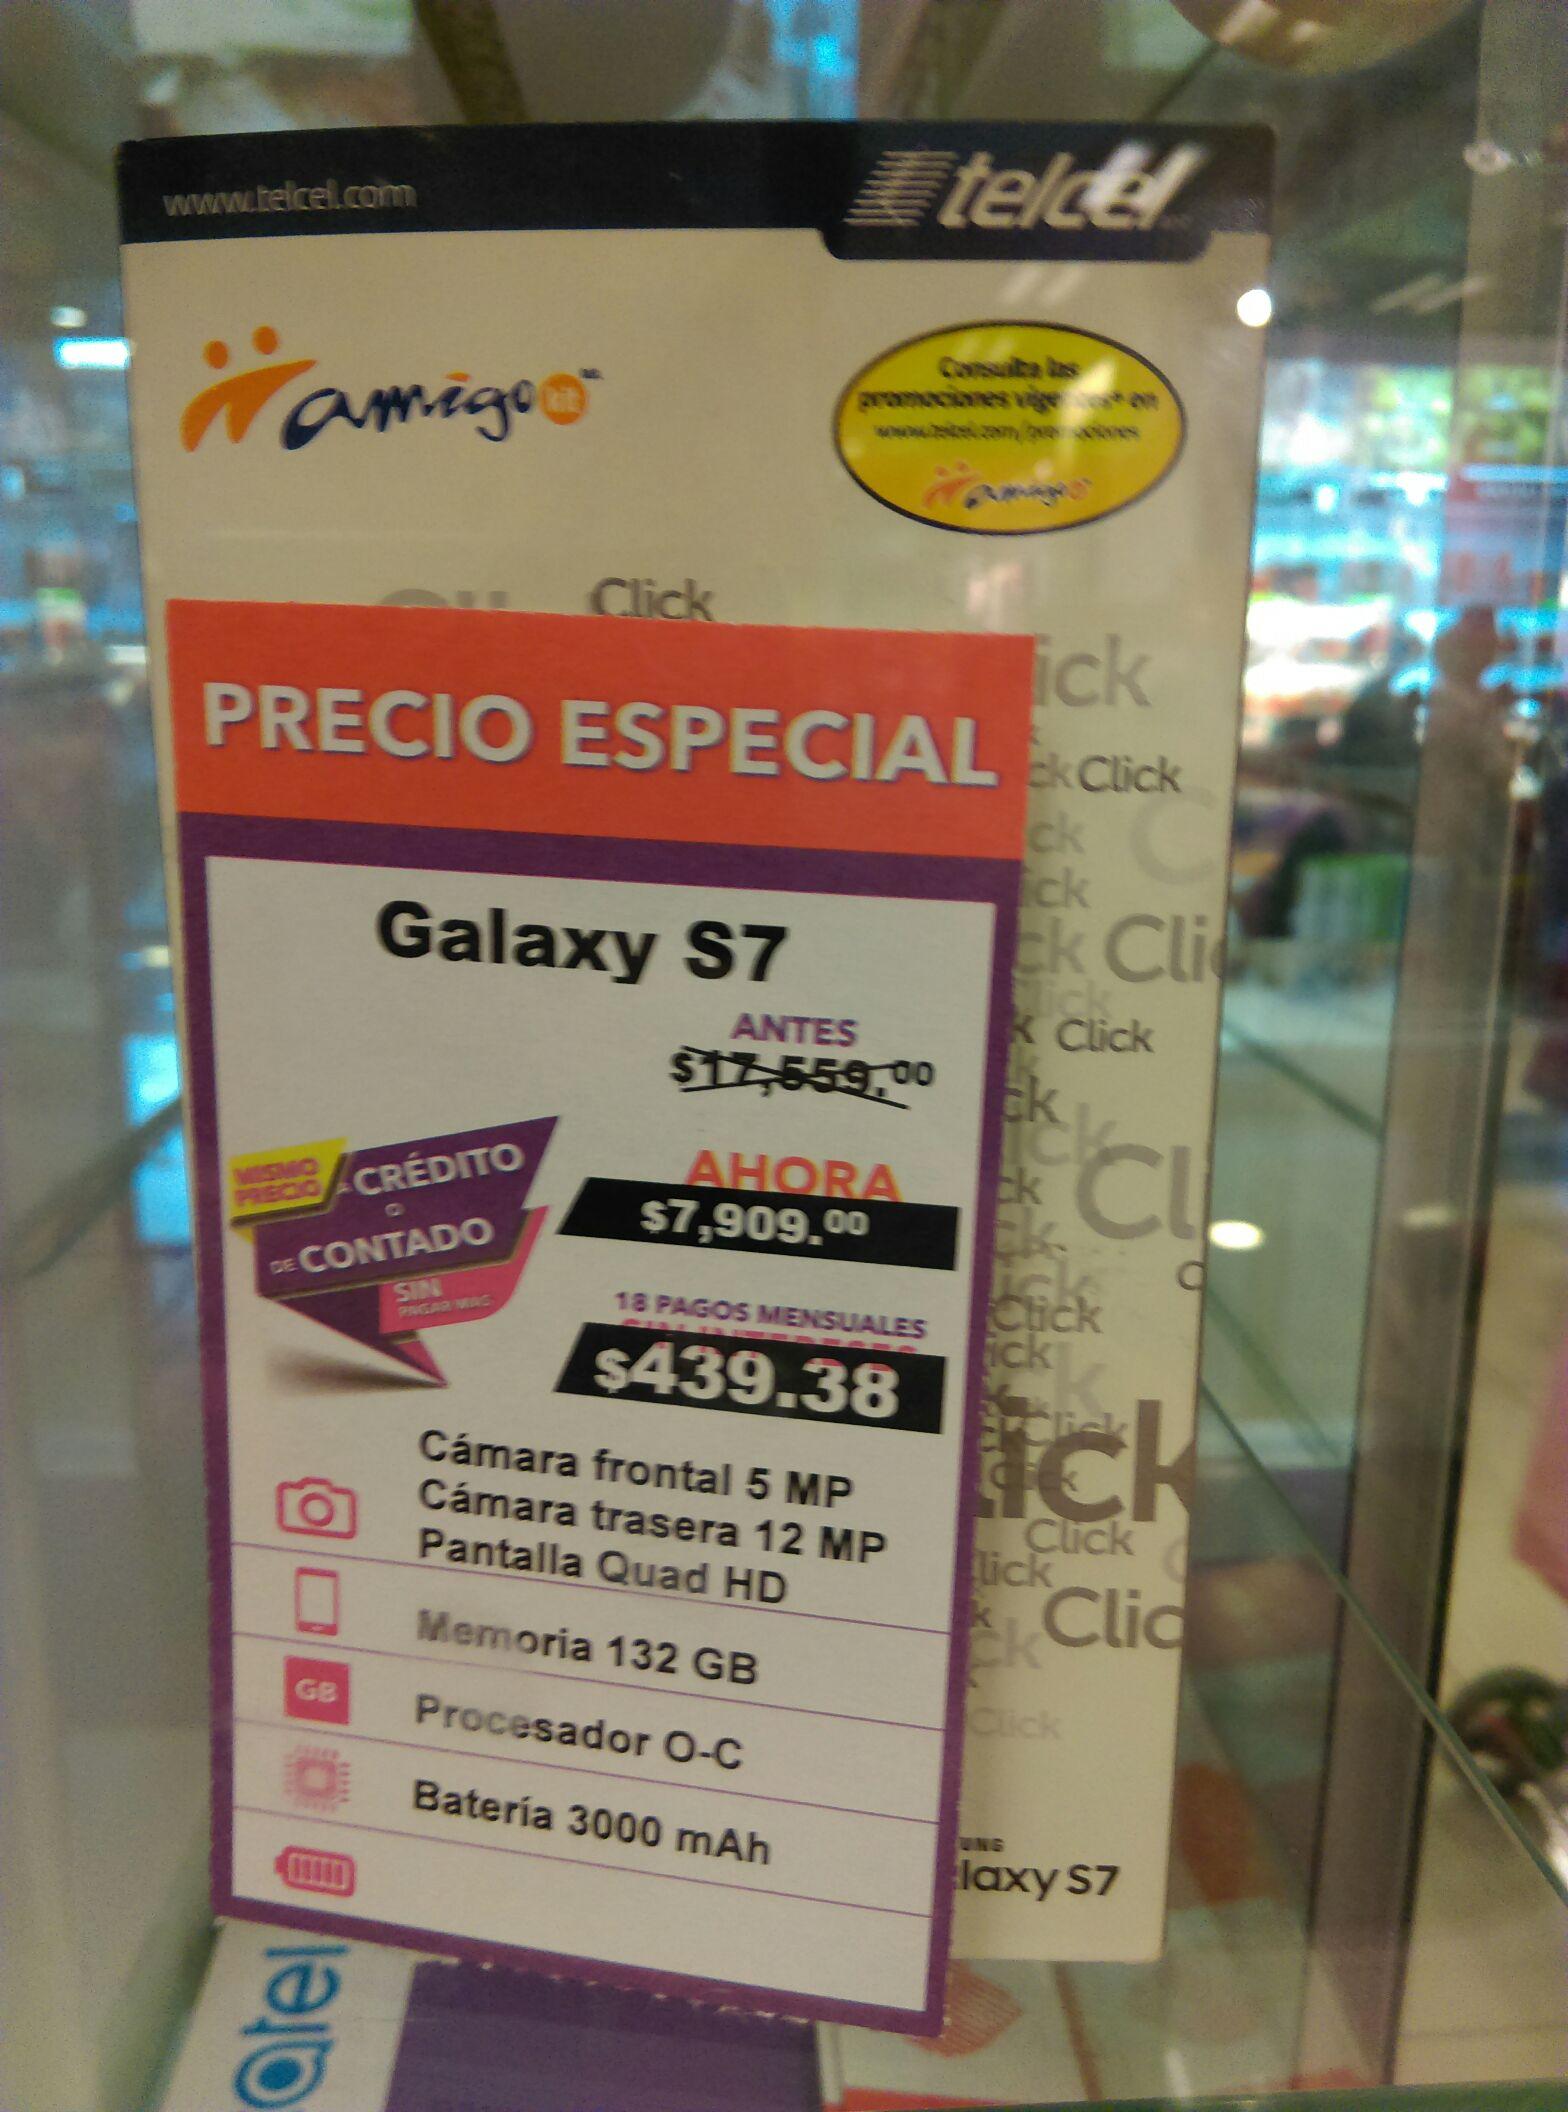 Buen Fin 2017 en Suburbia: Samsung Galaxy S7 flat con 1977 pesos en monedero electronico.